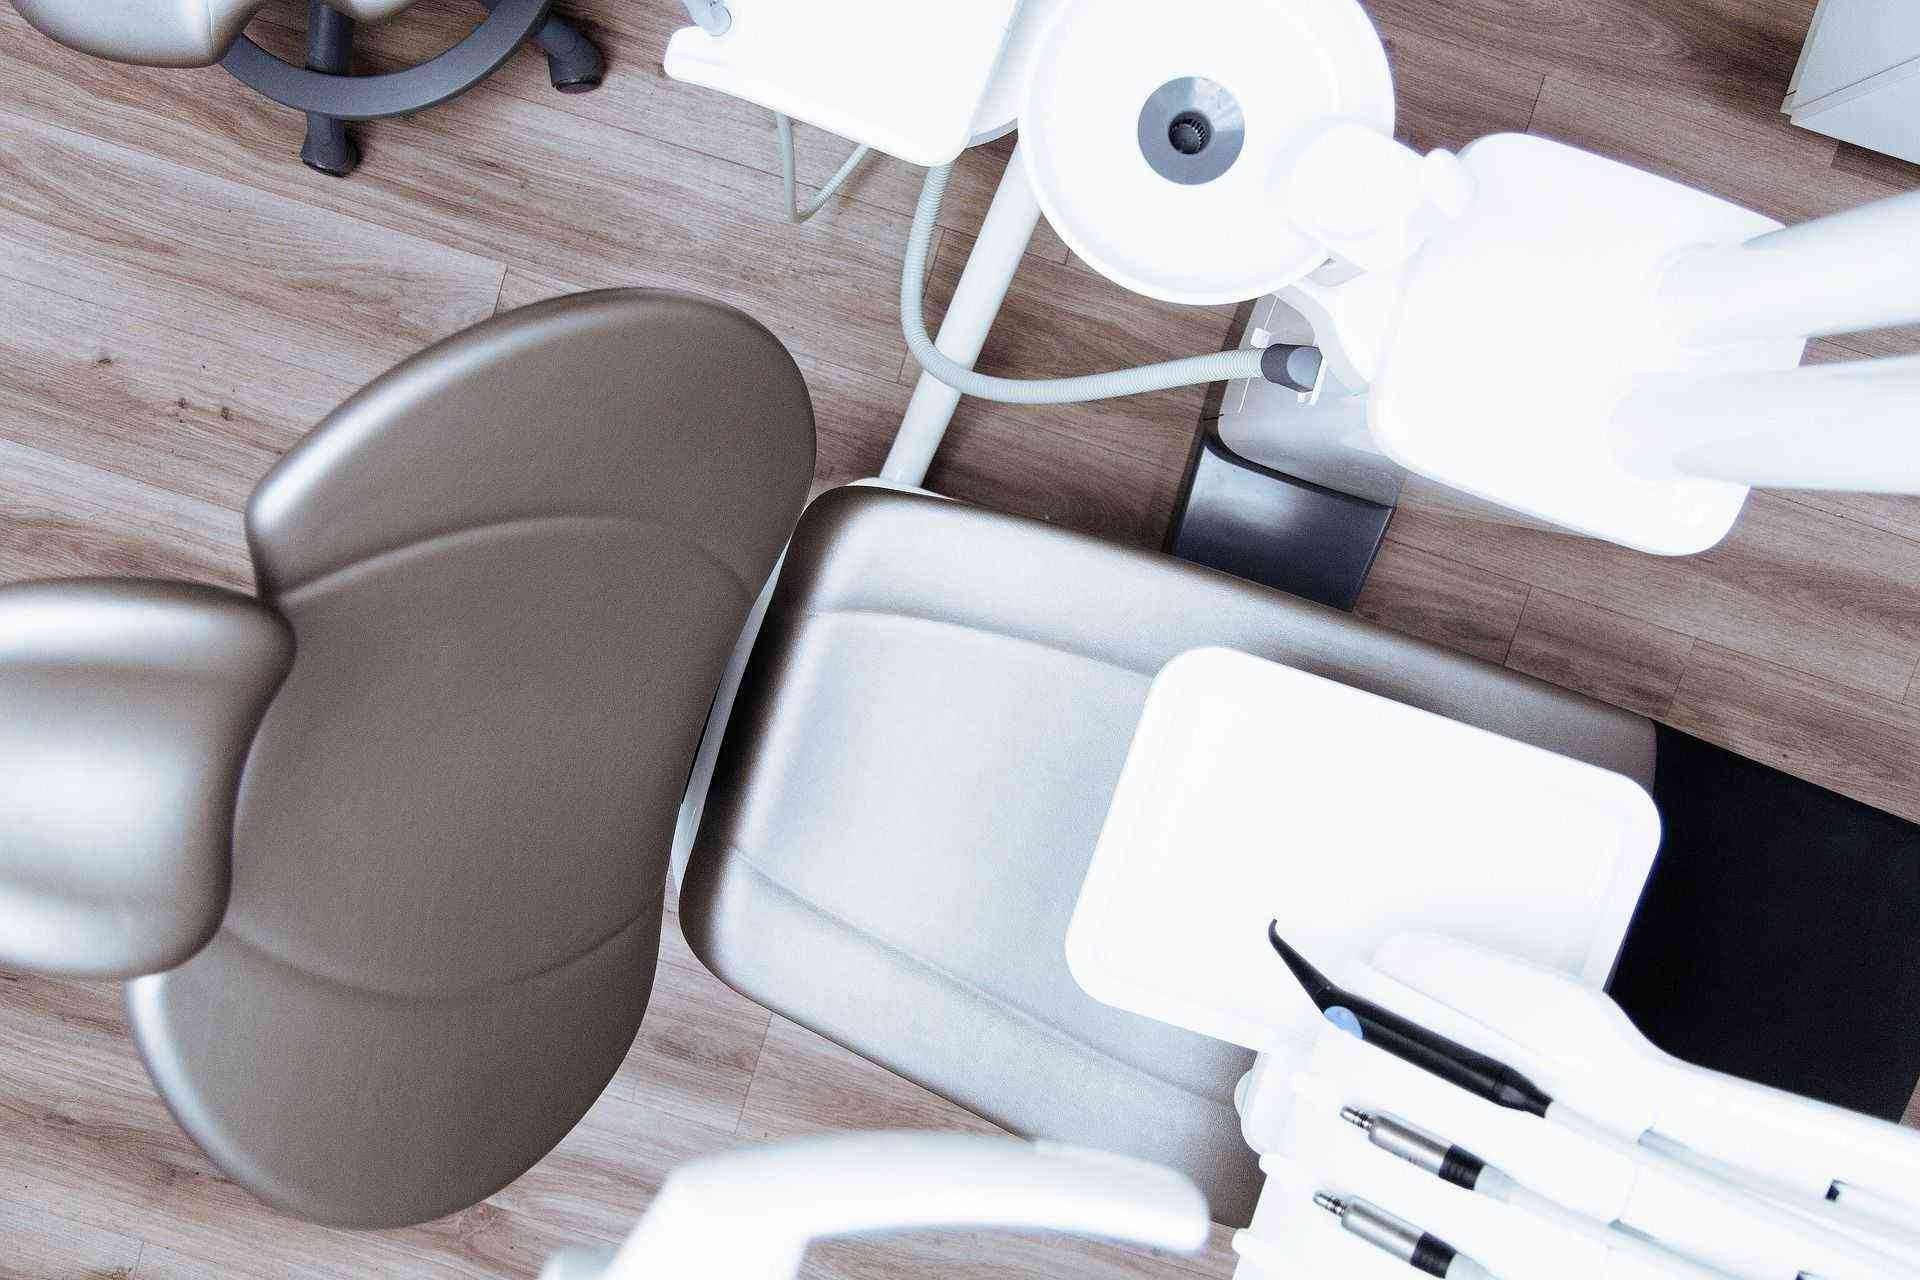 Rețea cabinete stomatologice